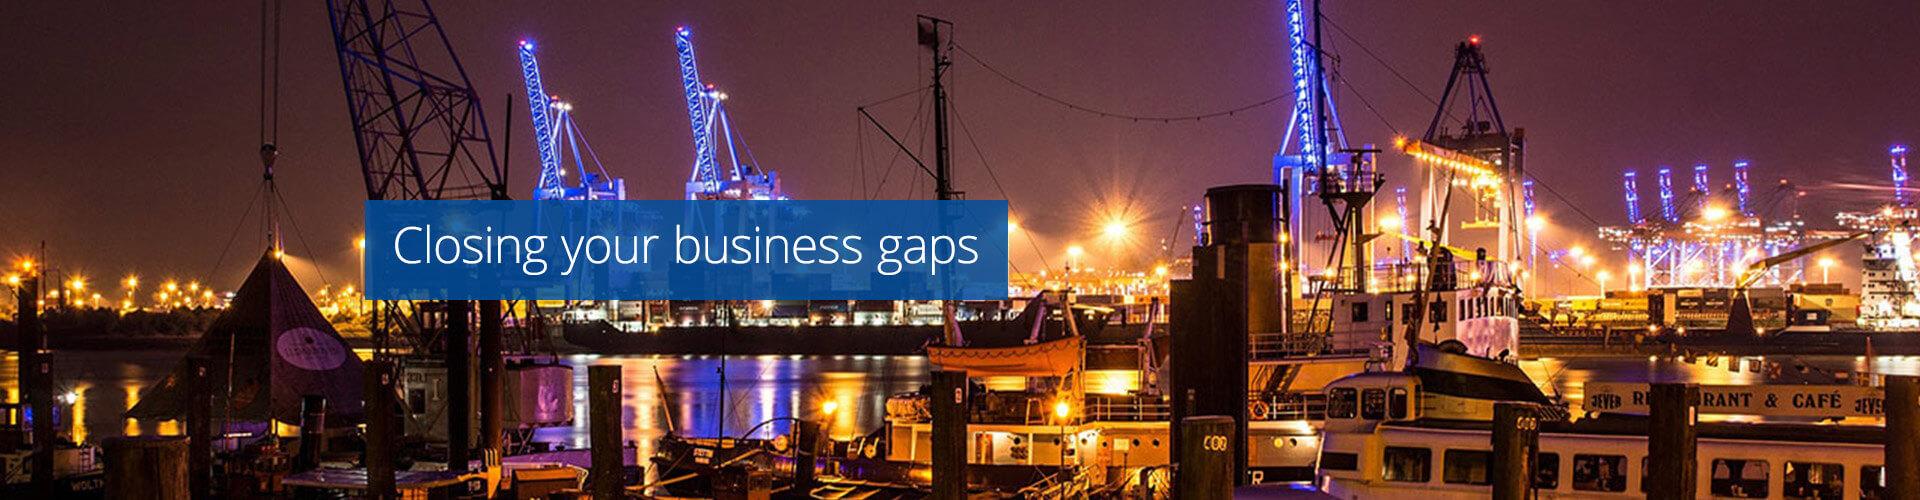 Closing business gaps